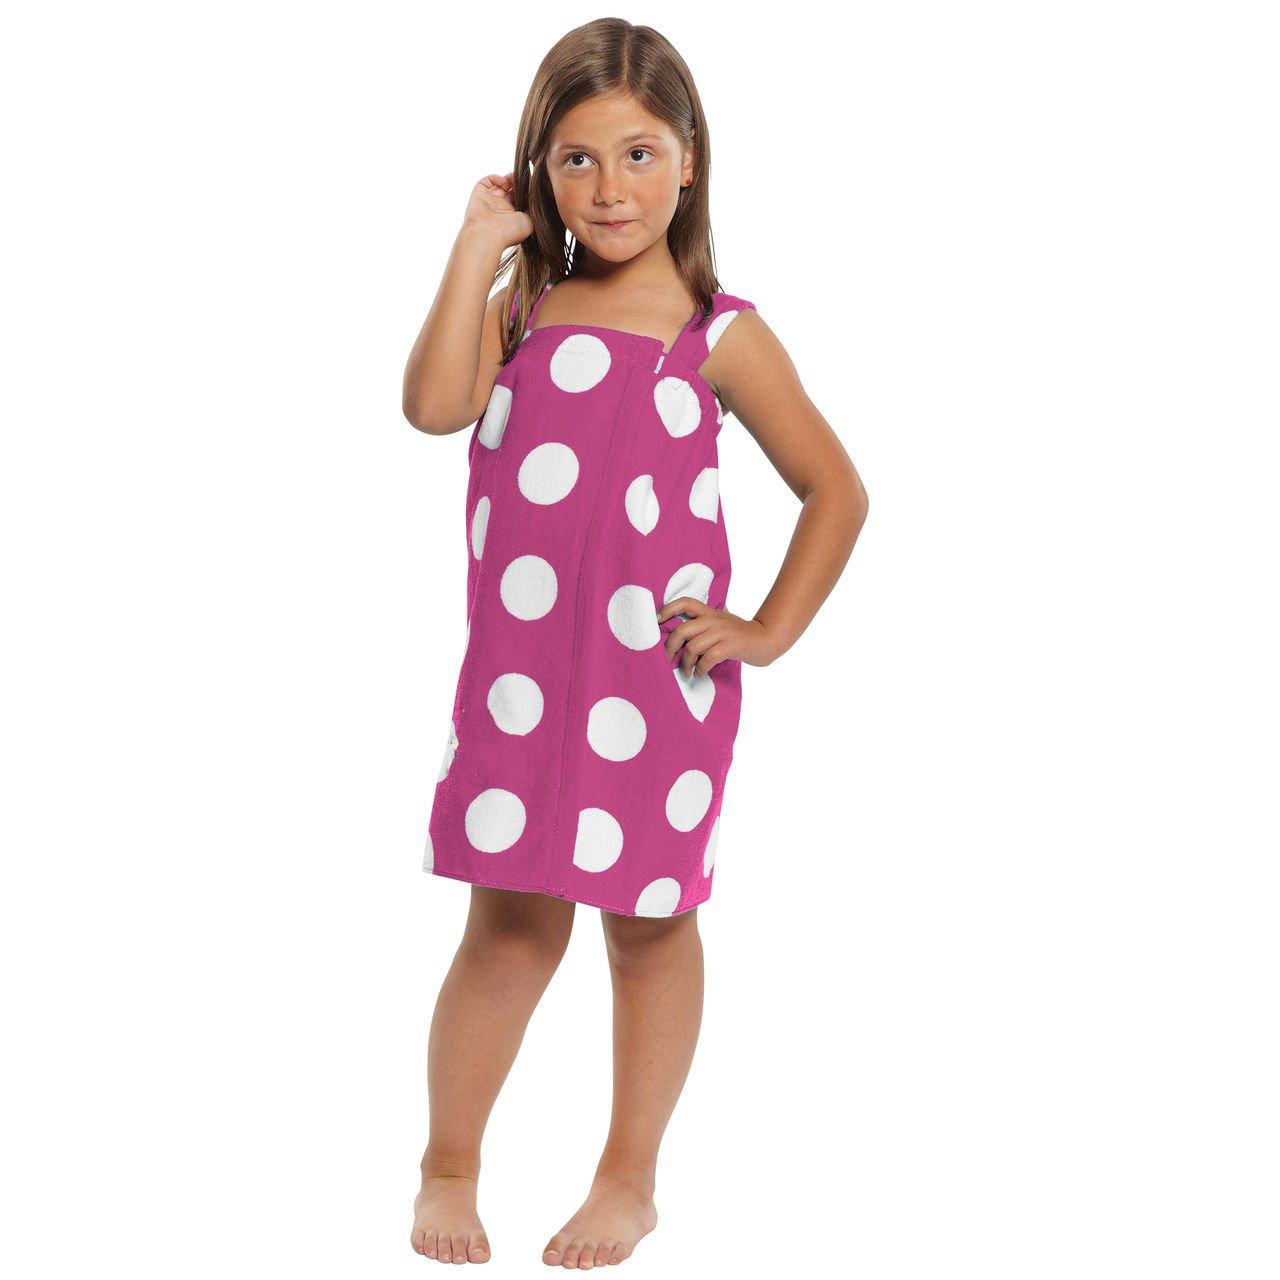 TowelRobes Kids Polka Dot Terry Velour Bath Wrap Towel 100% Absorbent Cotton for Kids